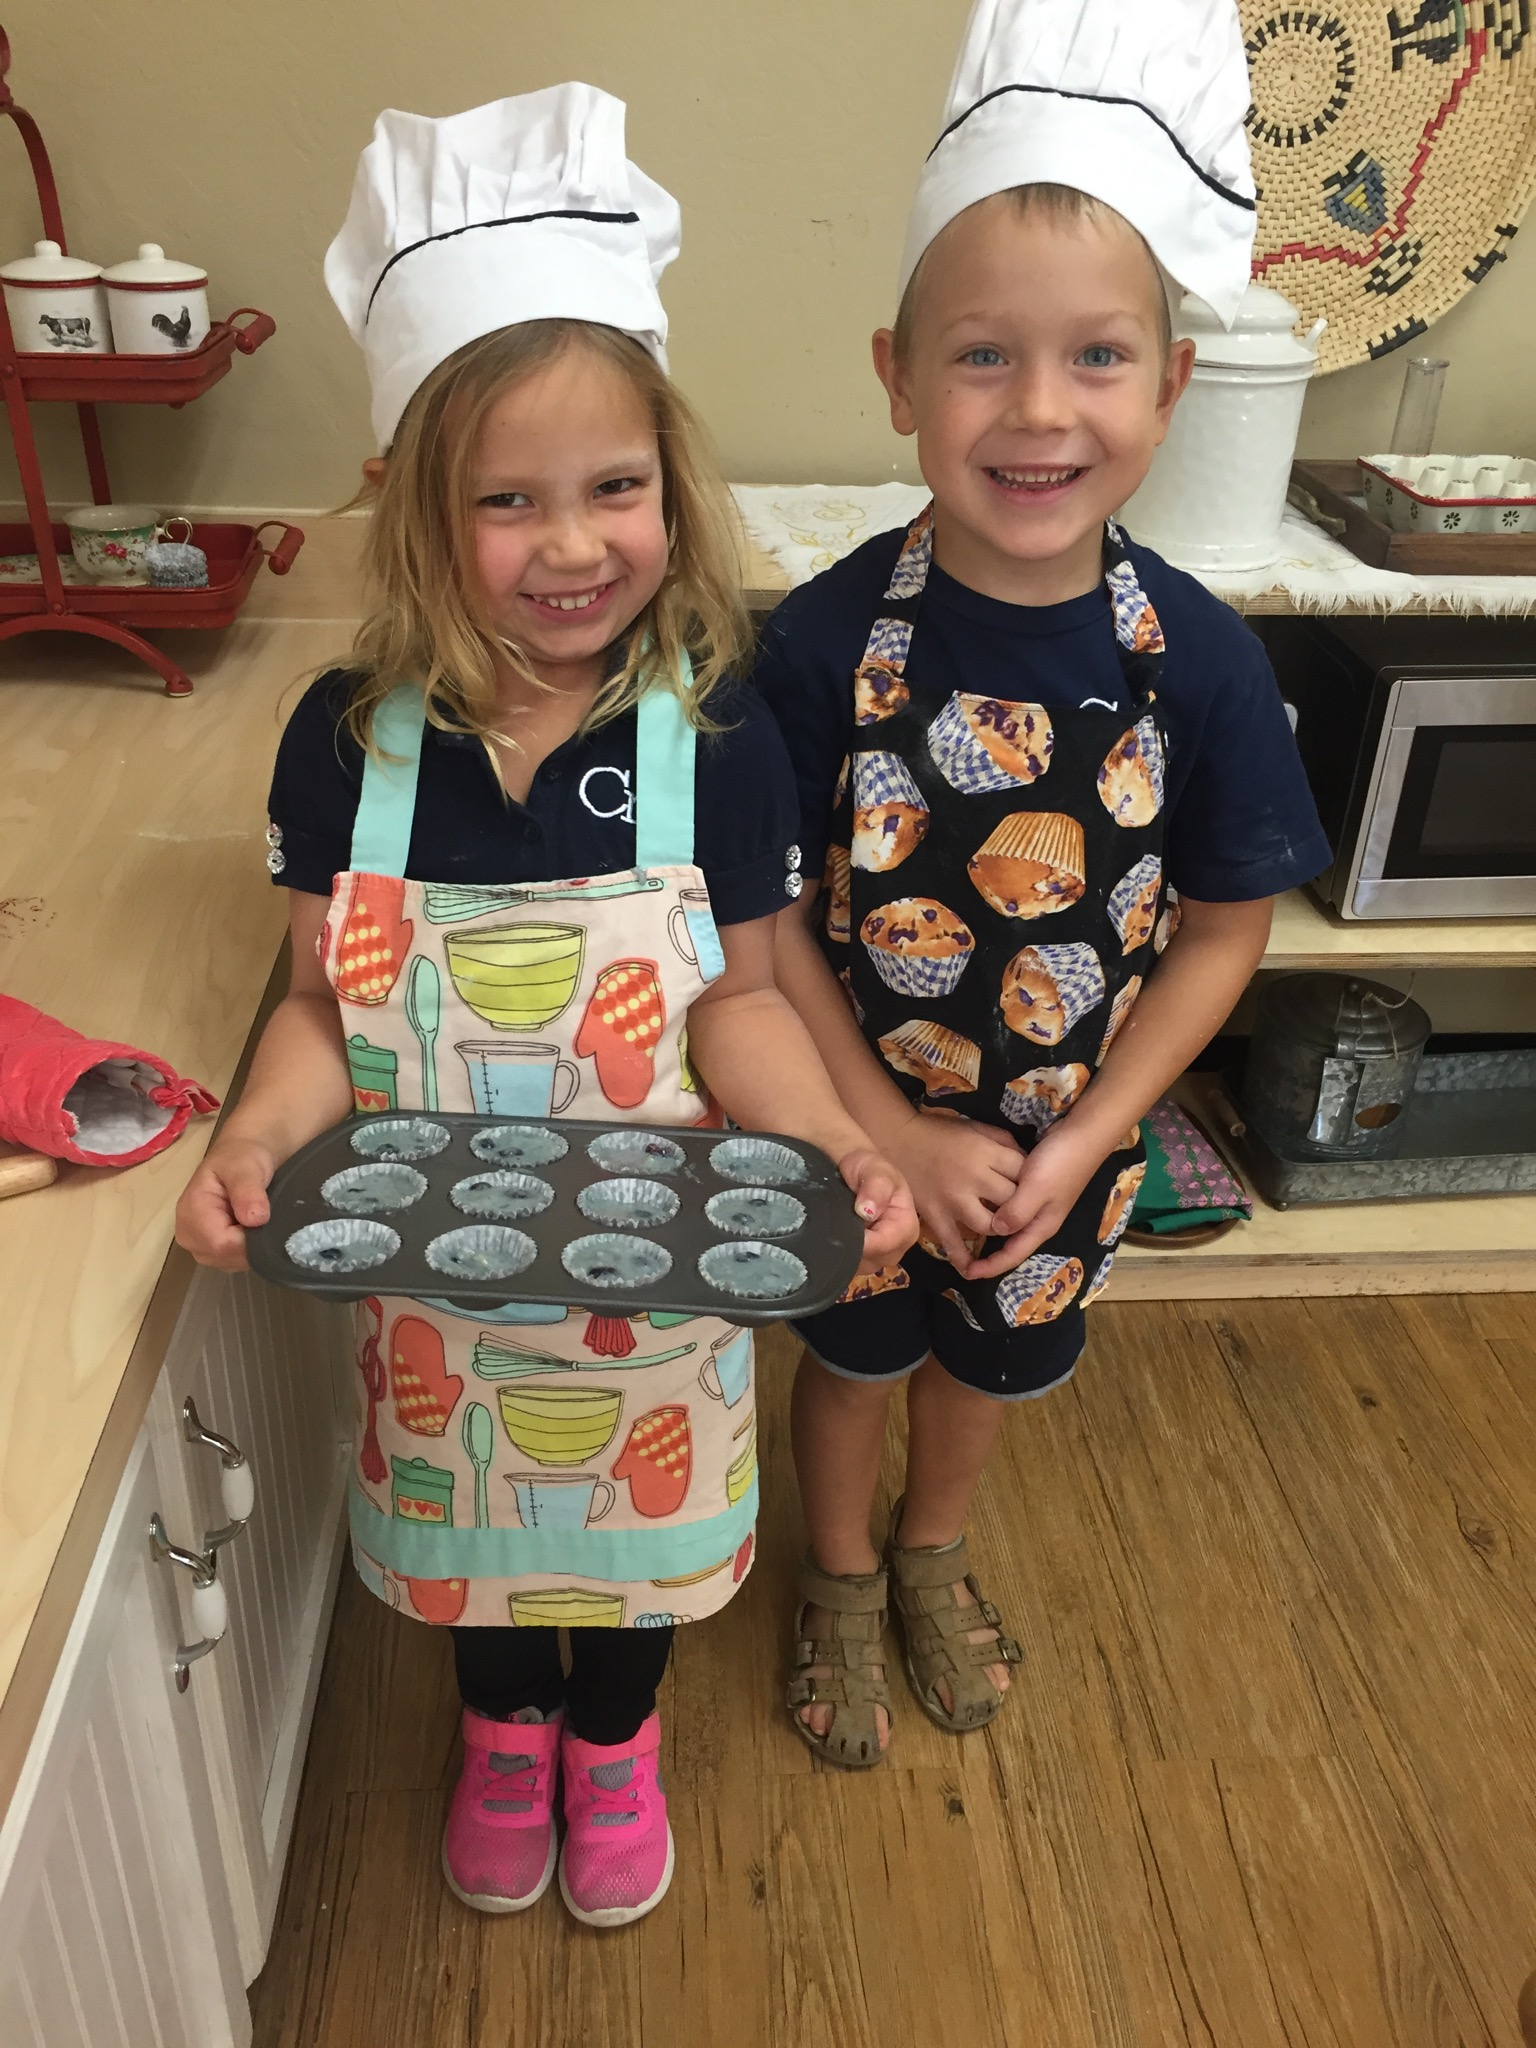 Baking blueberry muffins on her Birthday!